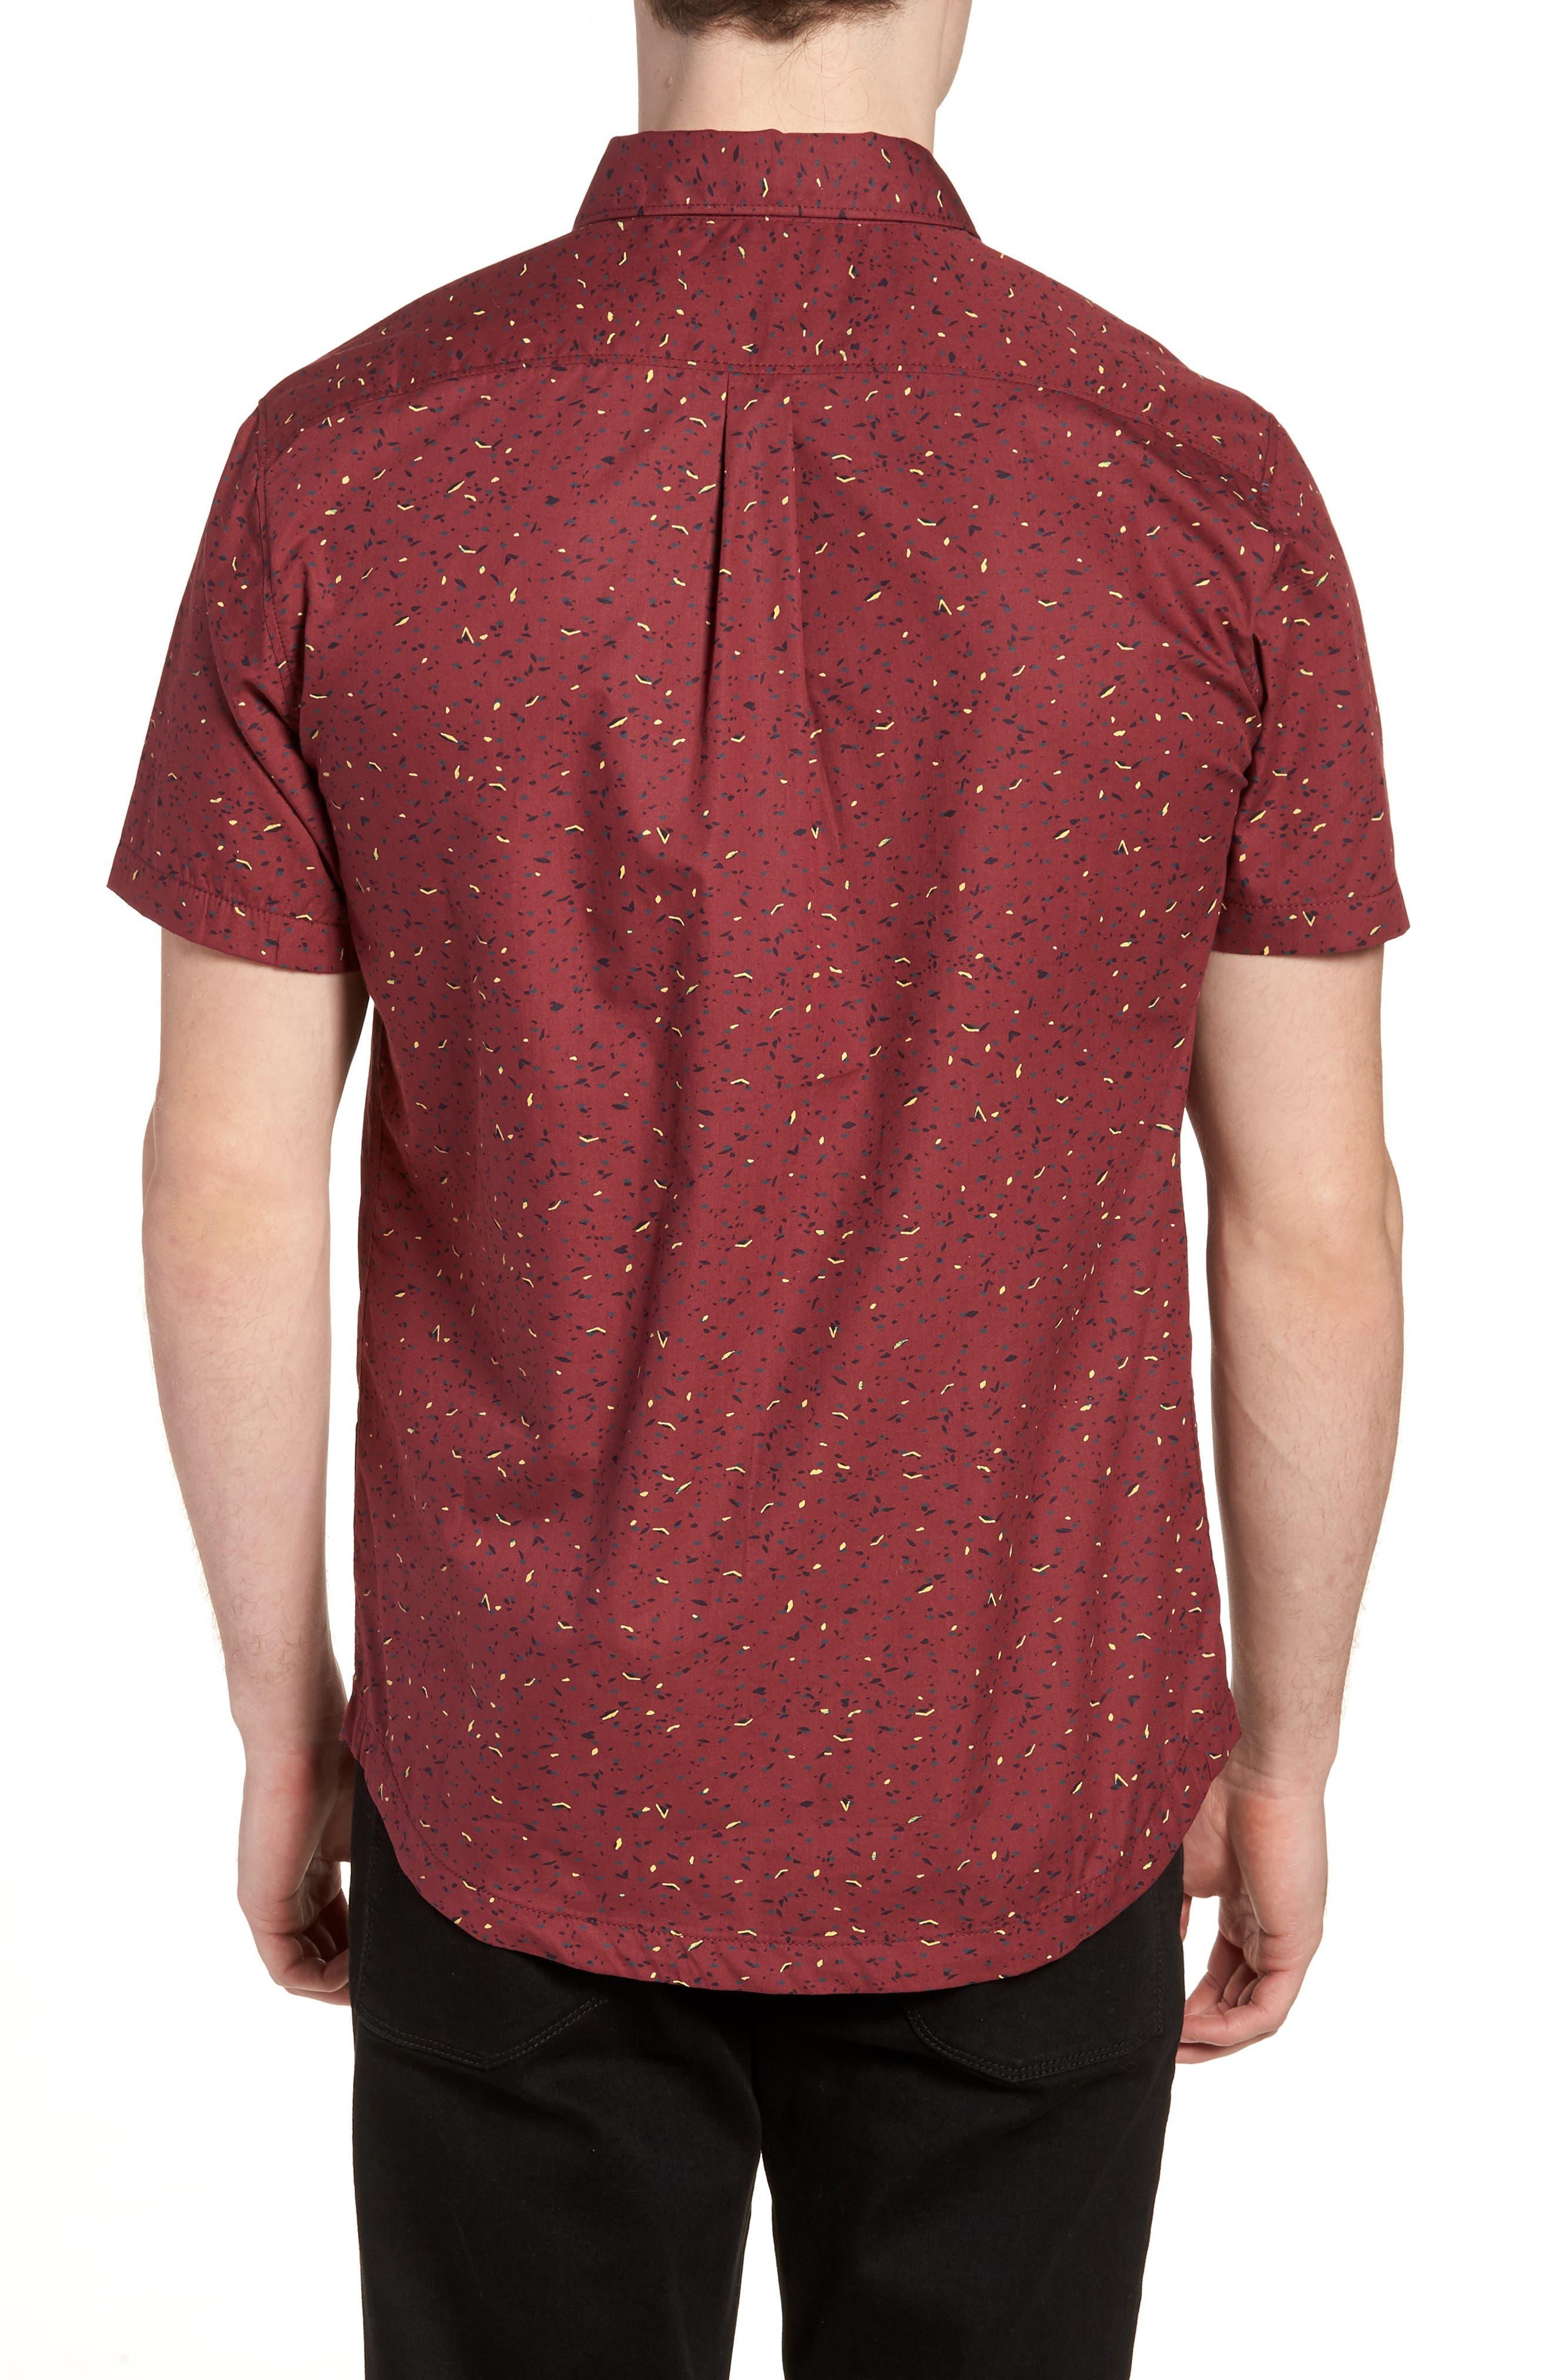 Jaded Woven Shirt,                             Alternate thumbnail 3, color,                             Tawny Port